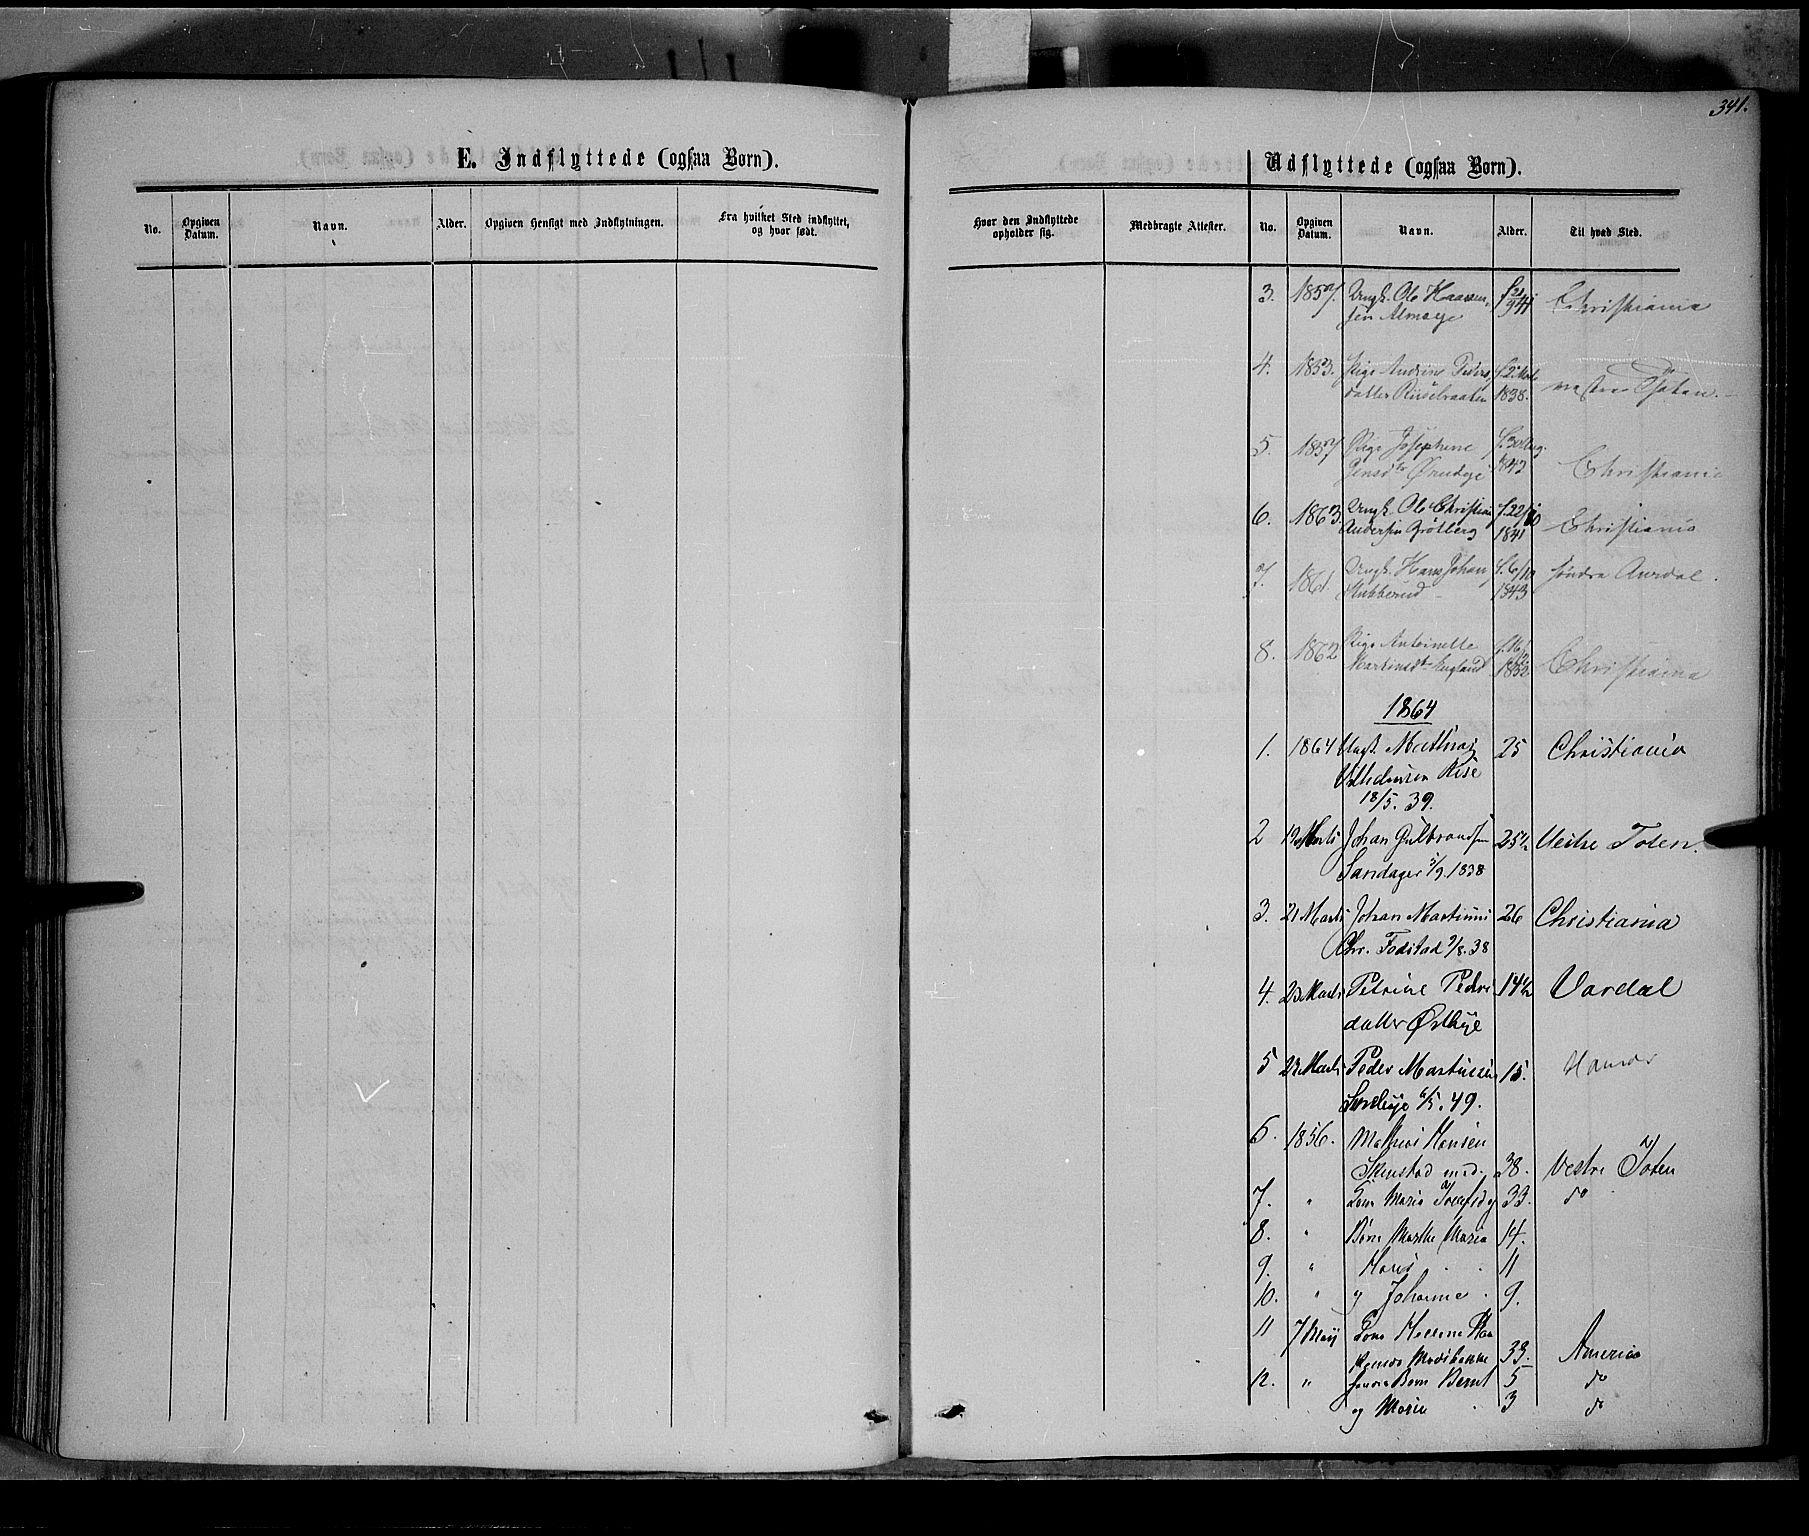 SAH, Østre Toten prestekontor, Ministerialbok nr. 4, 1857-1865, s. 341